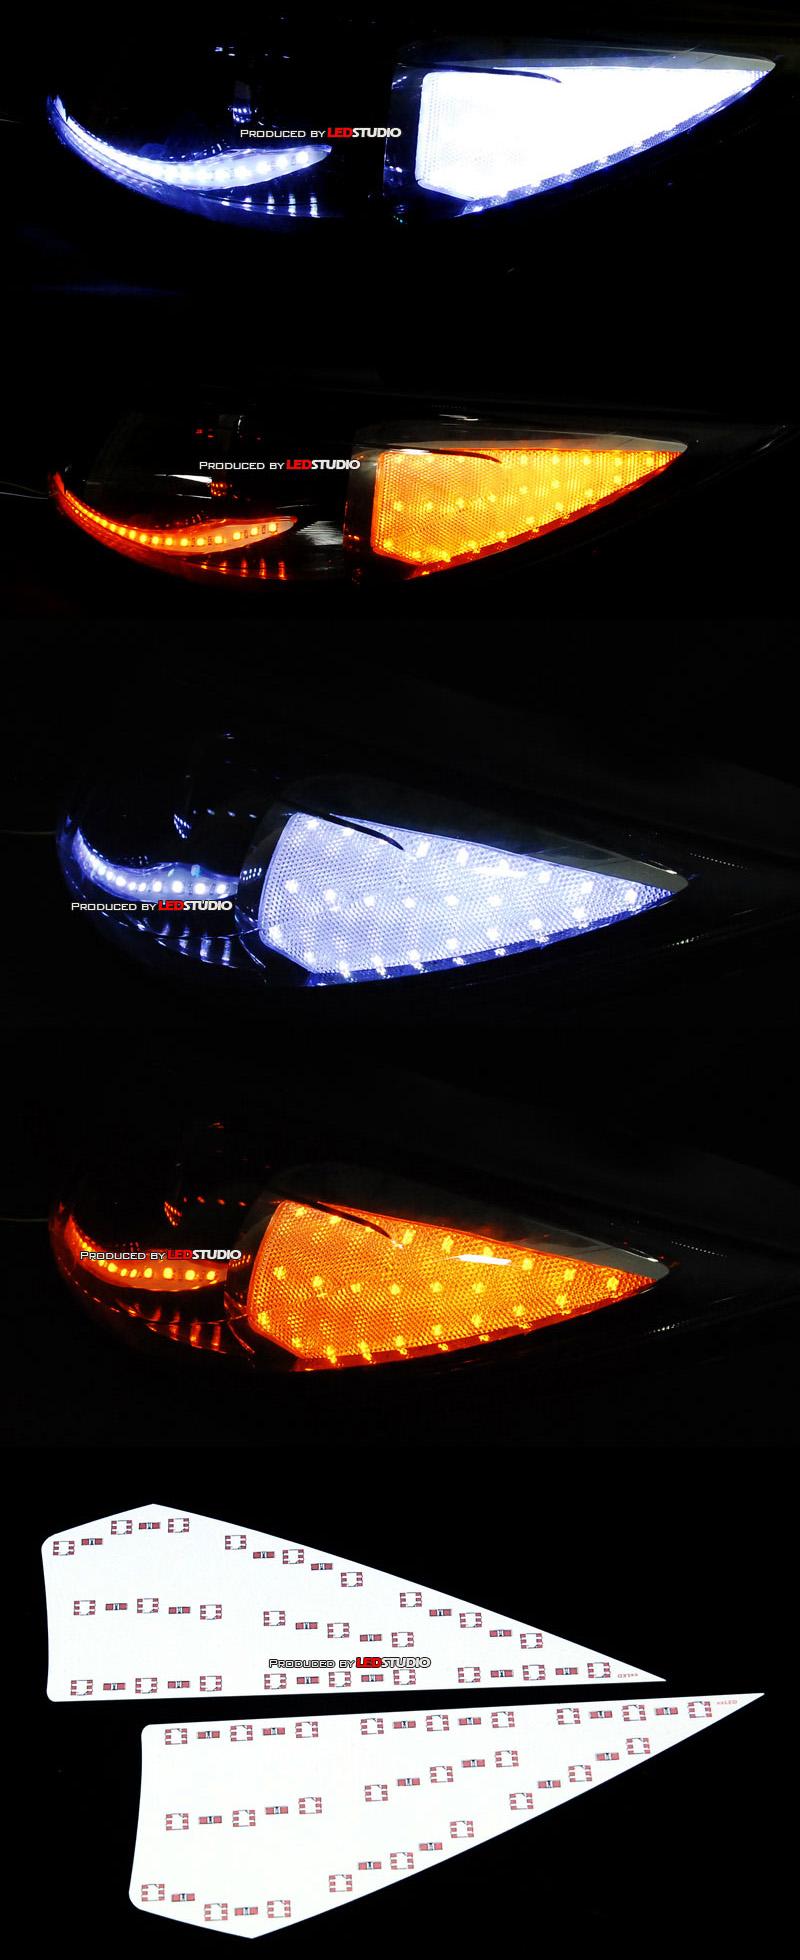 Платы боковых рефлекторов фар KIA SPORTAGE 2011 (бело-желтые) (2 шт)